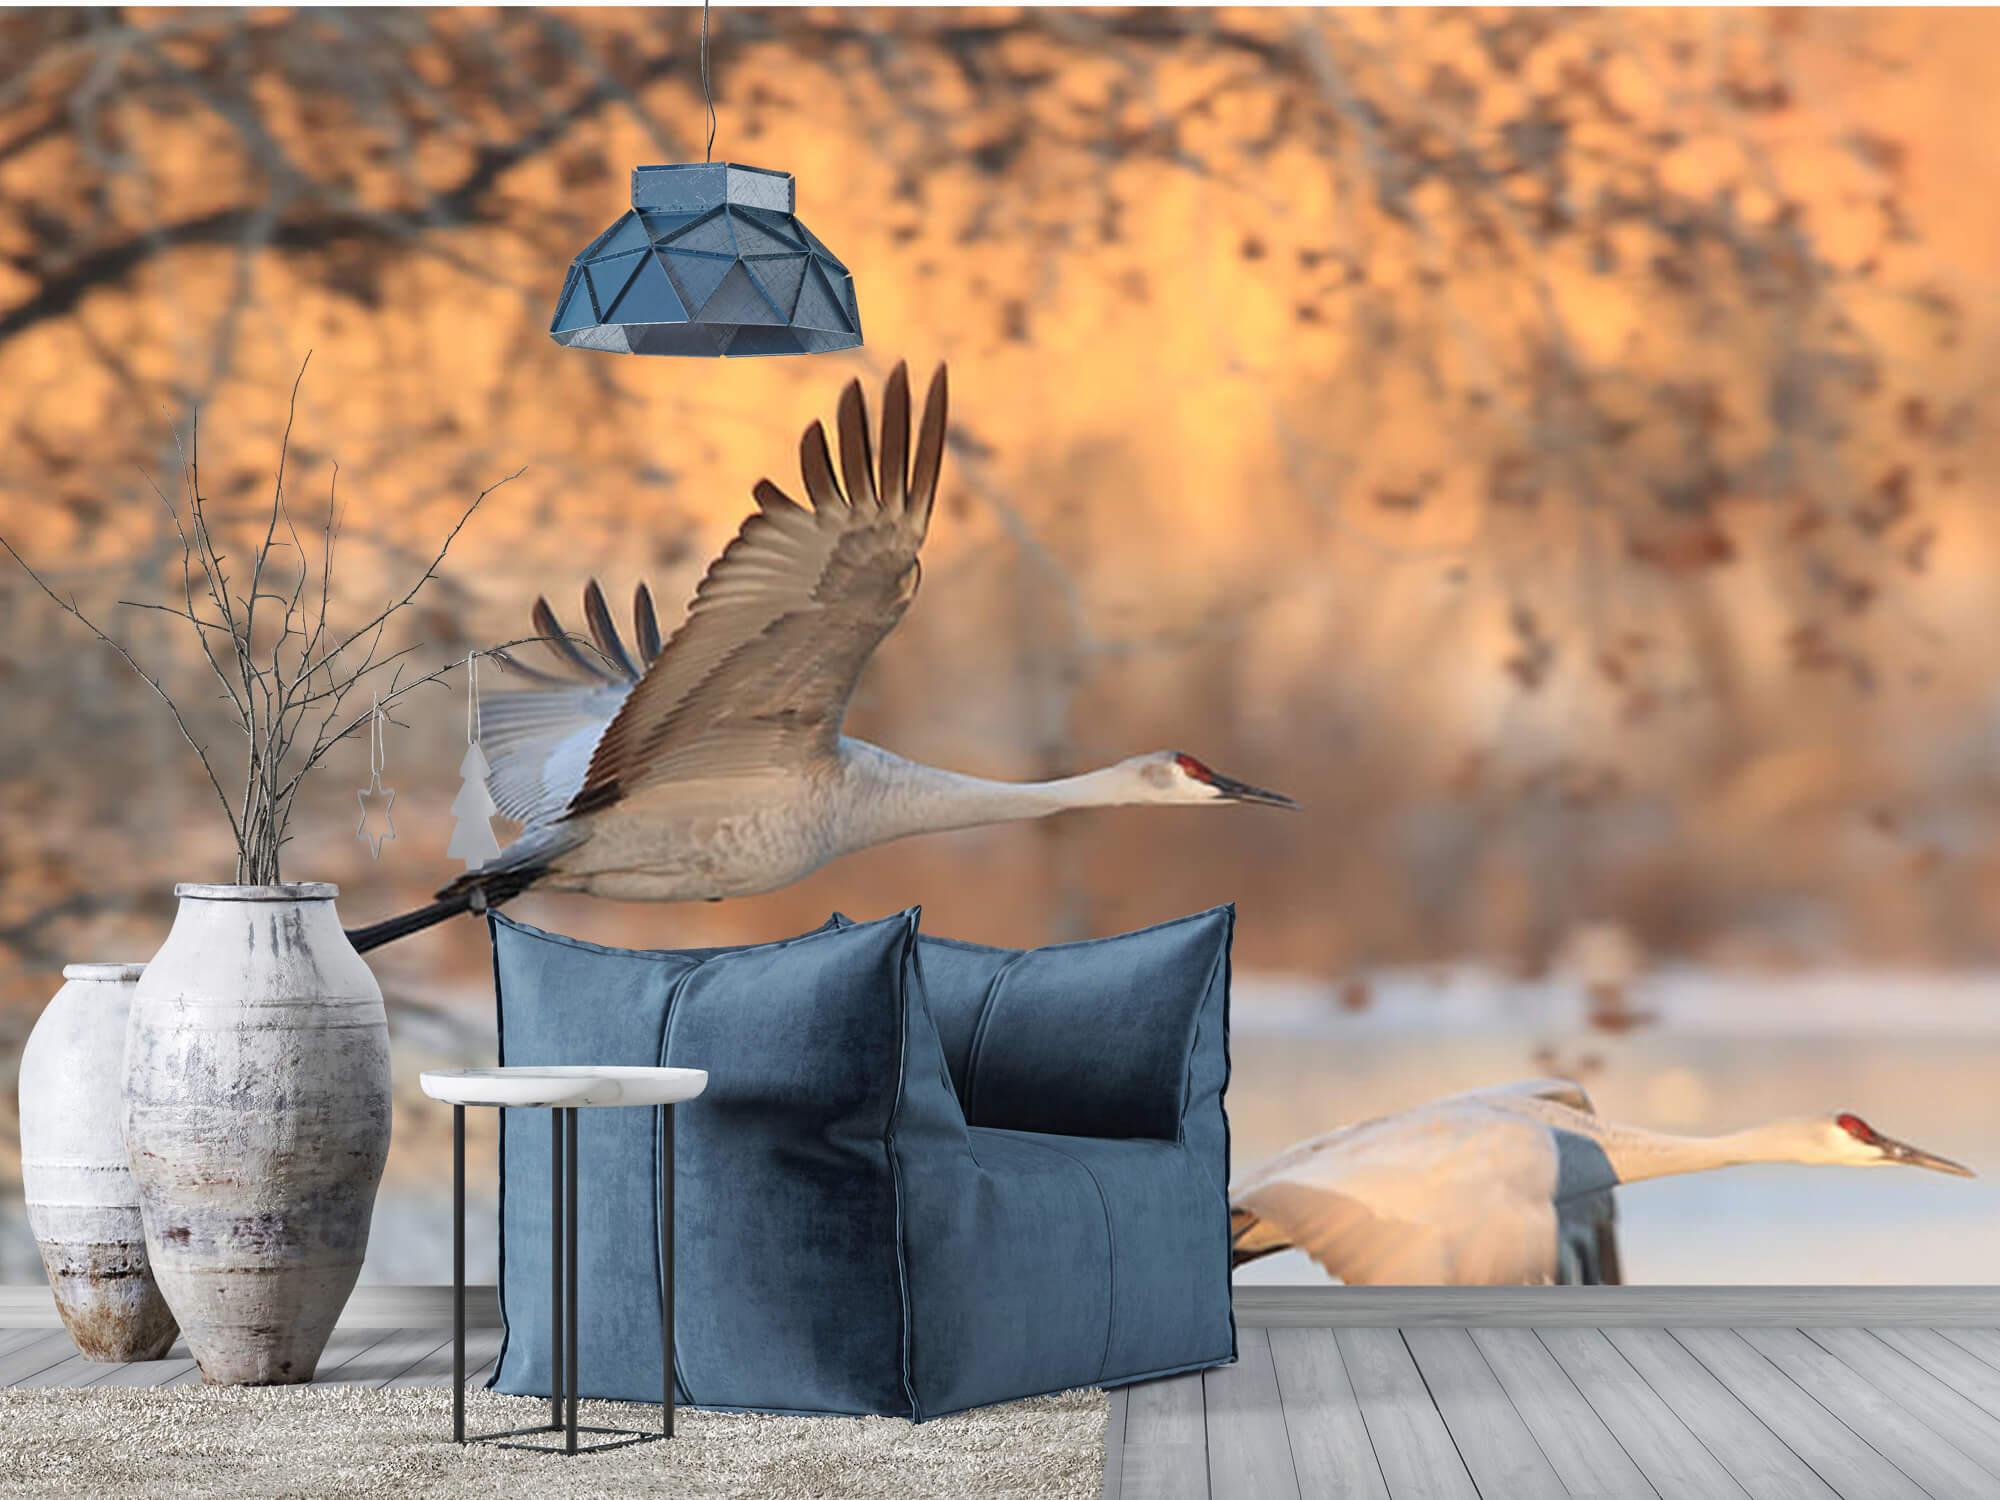 Vliegende kraanvogels 9